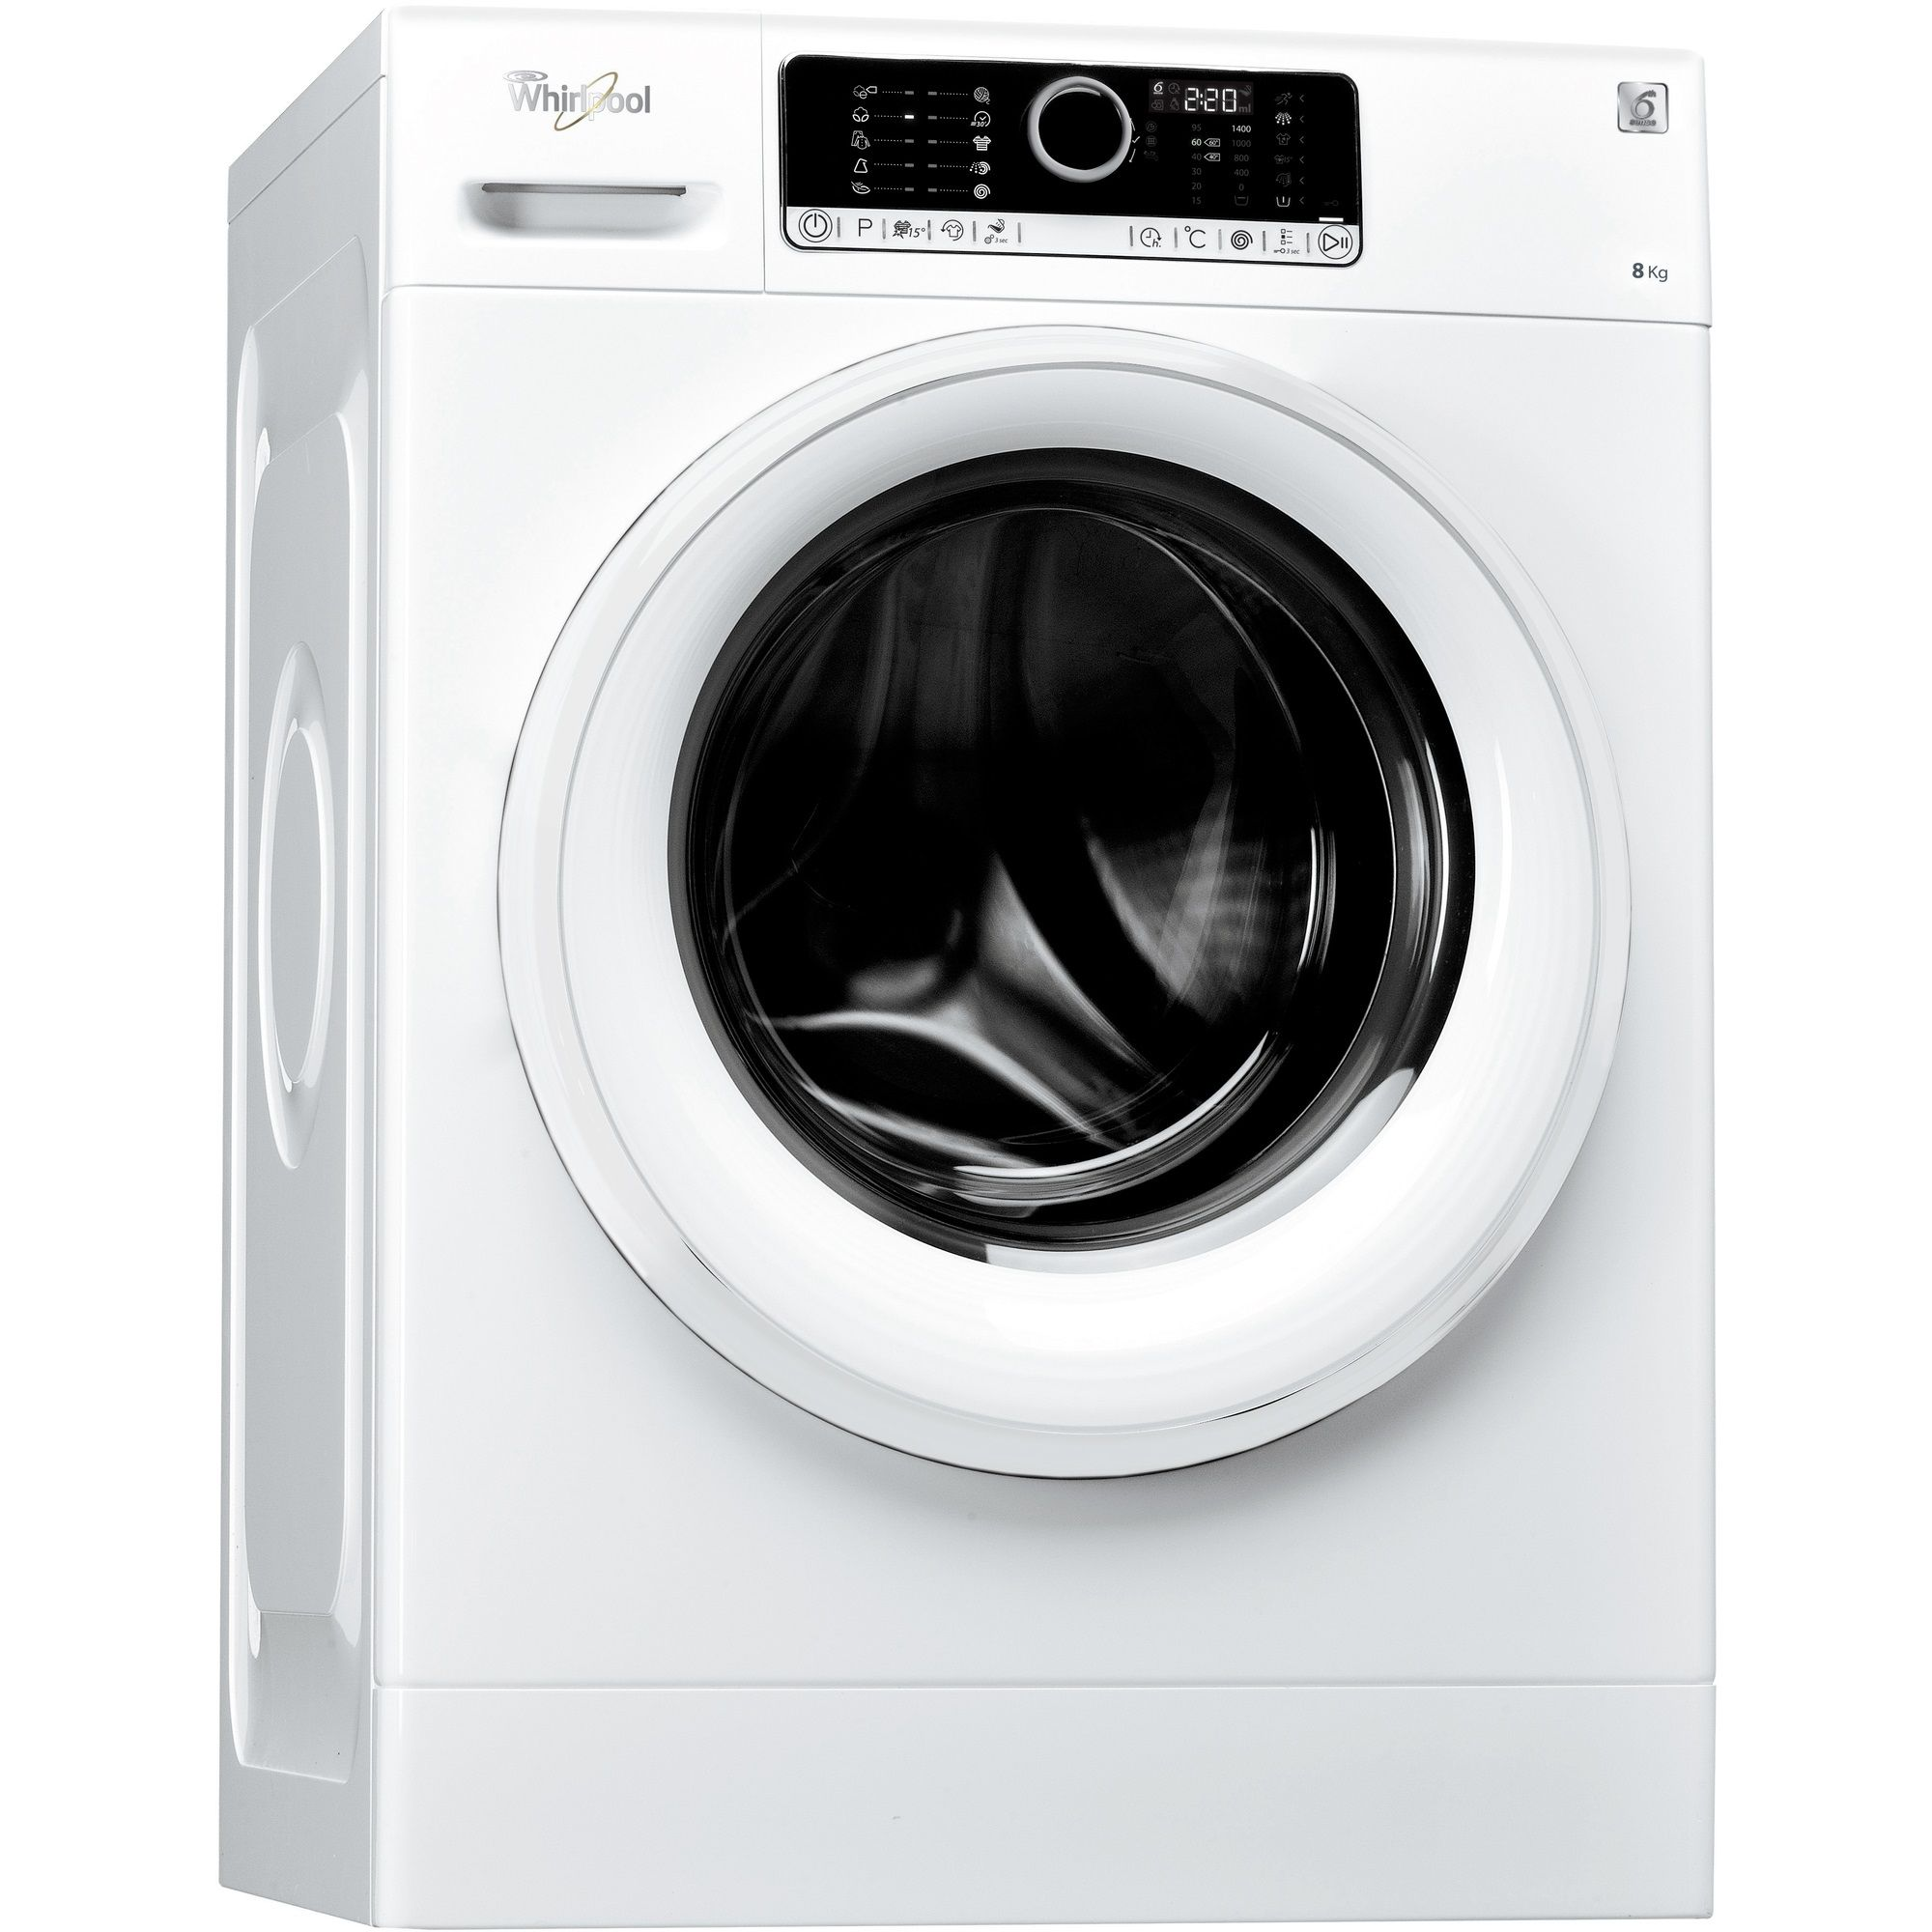 whirlpool-supreme-care-fscr80412